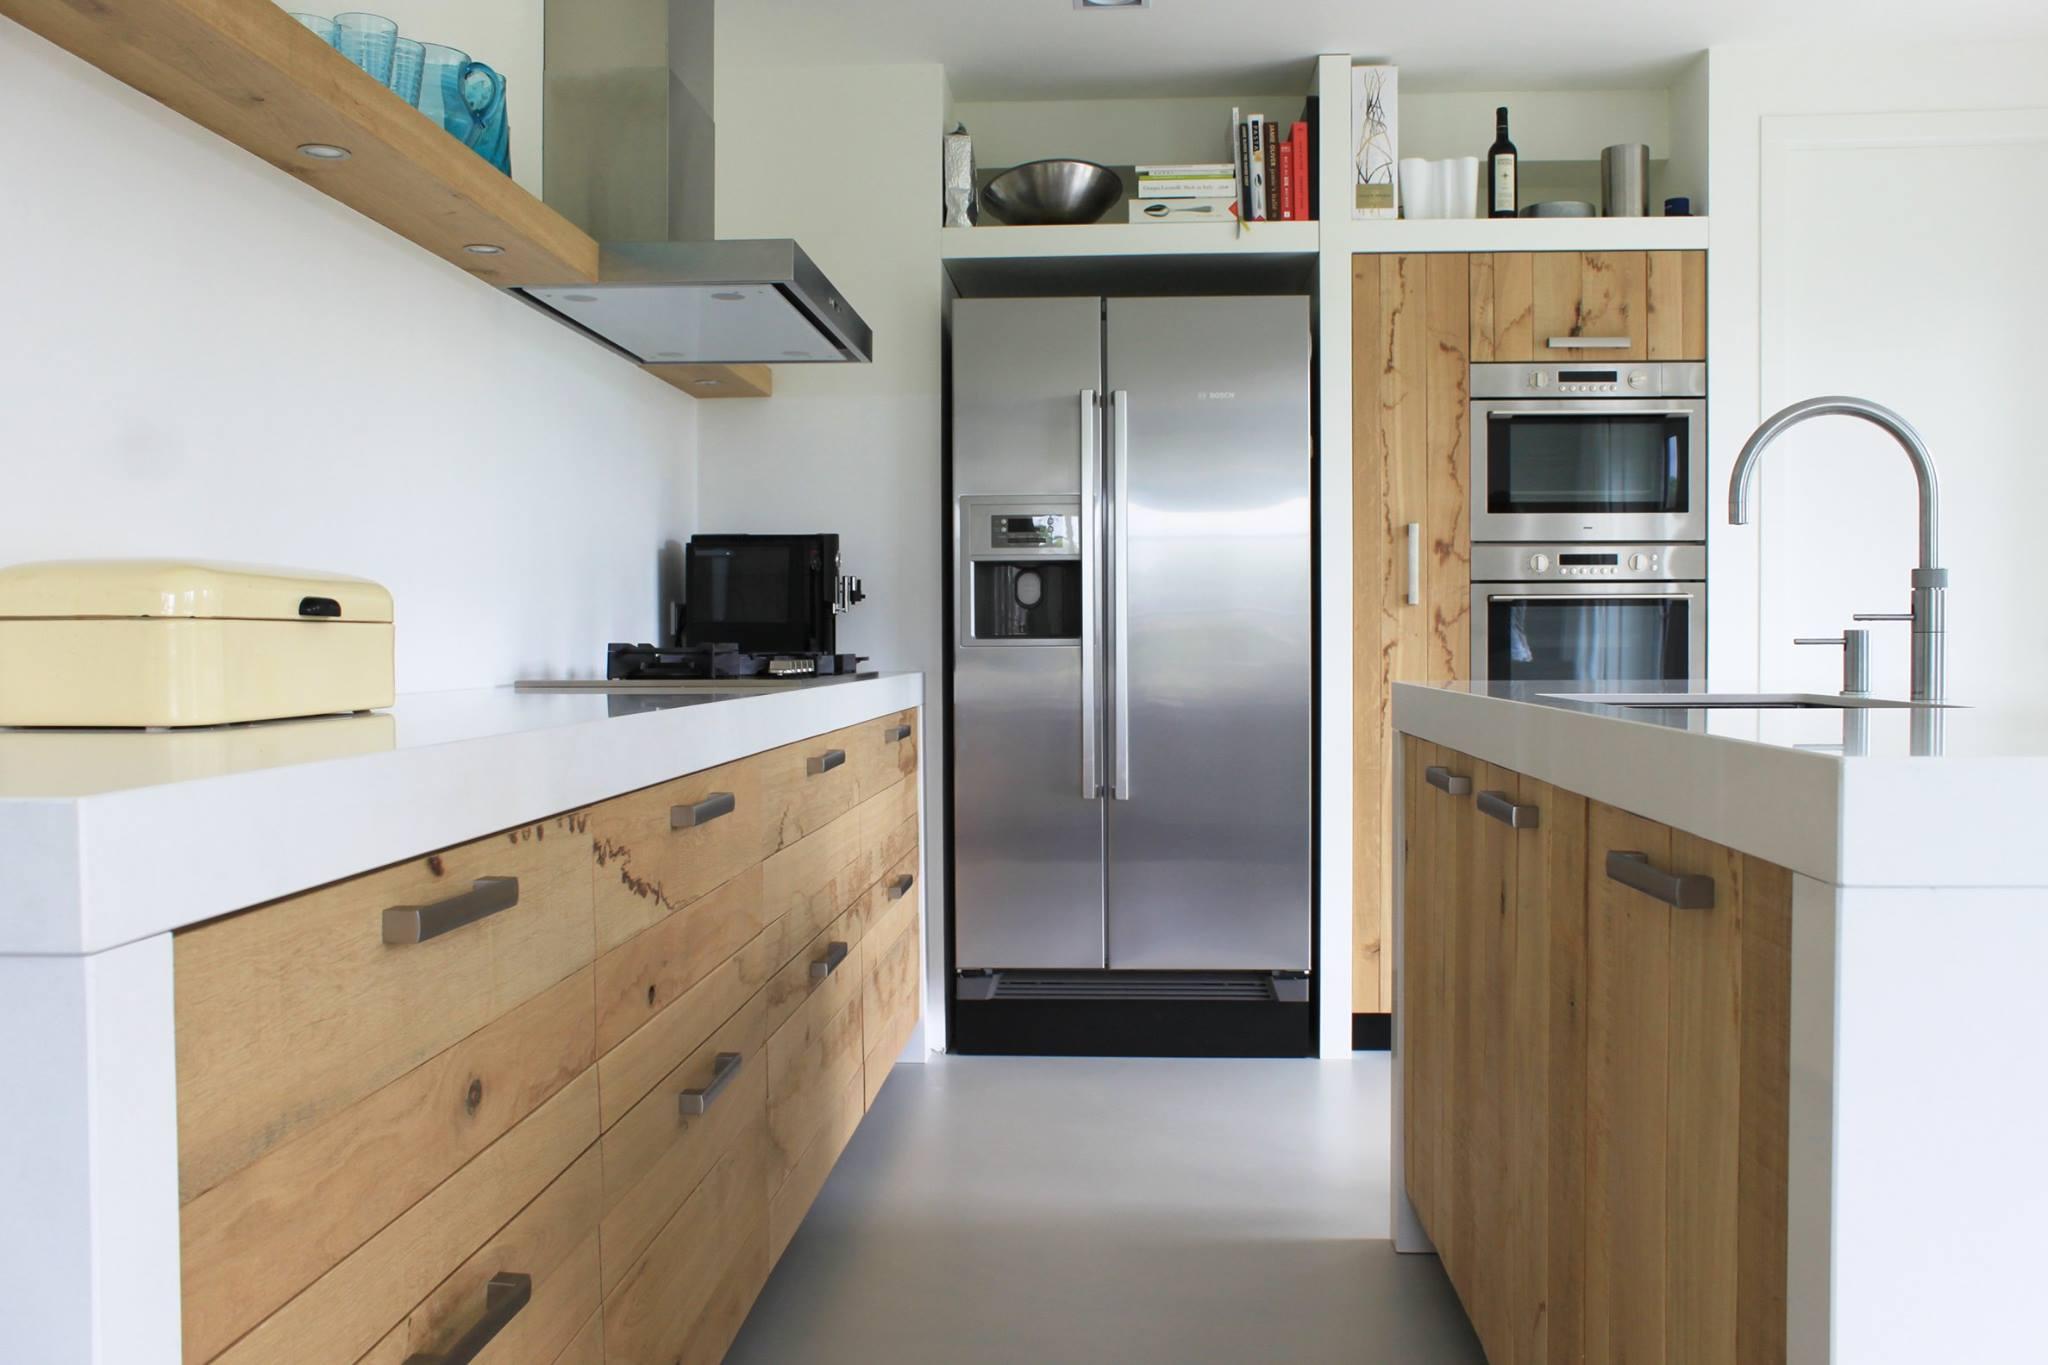 Houten keuken met keukeneiland en wit Silestone werkblad via JP Walker